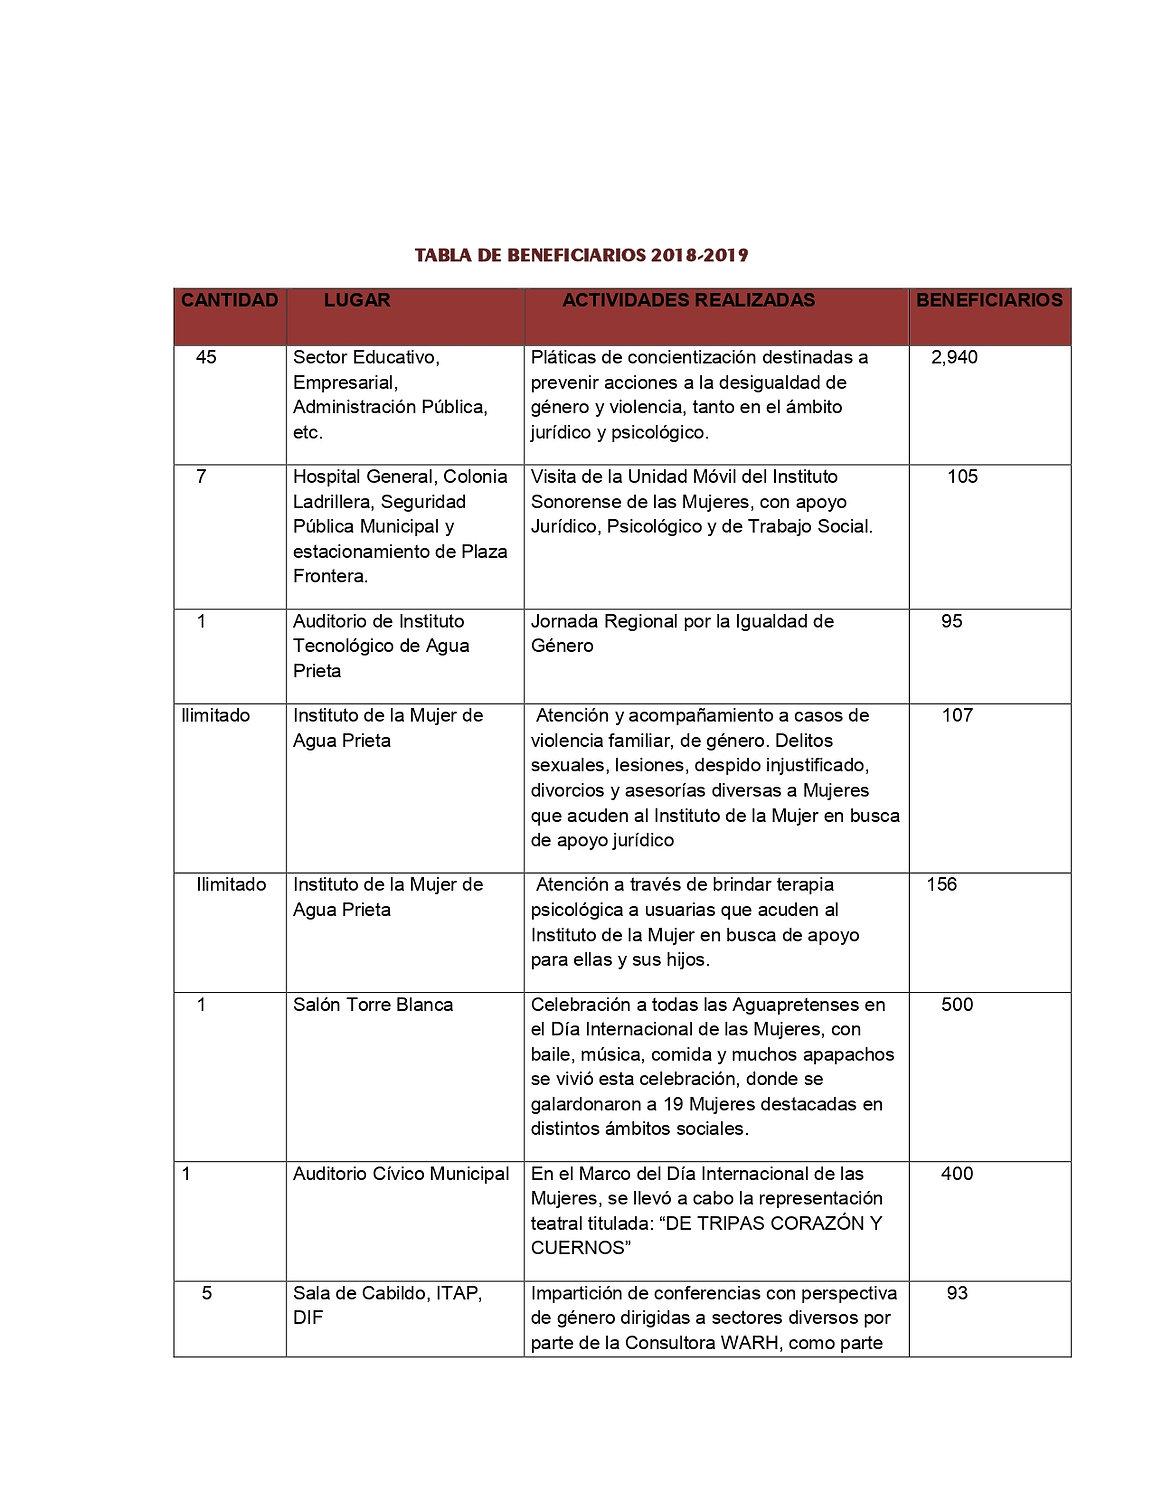 SEGUNDO INFORME  idm pdf_page-0007.jpg